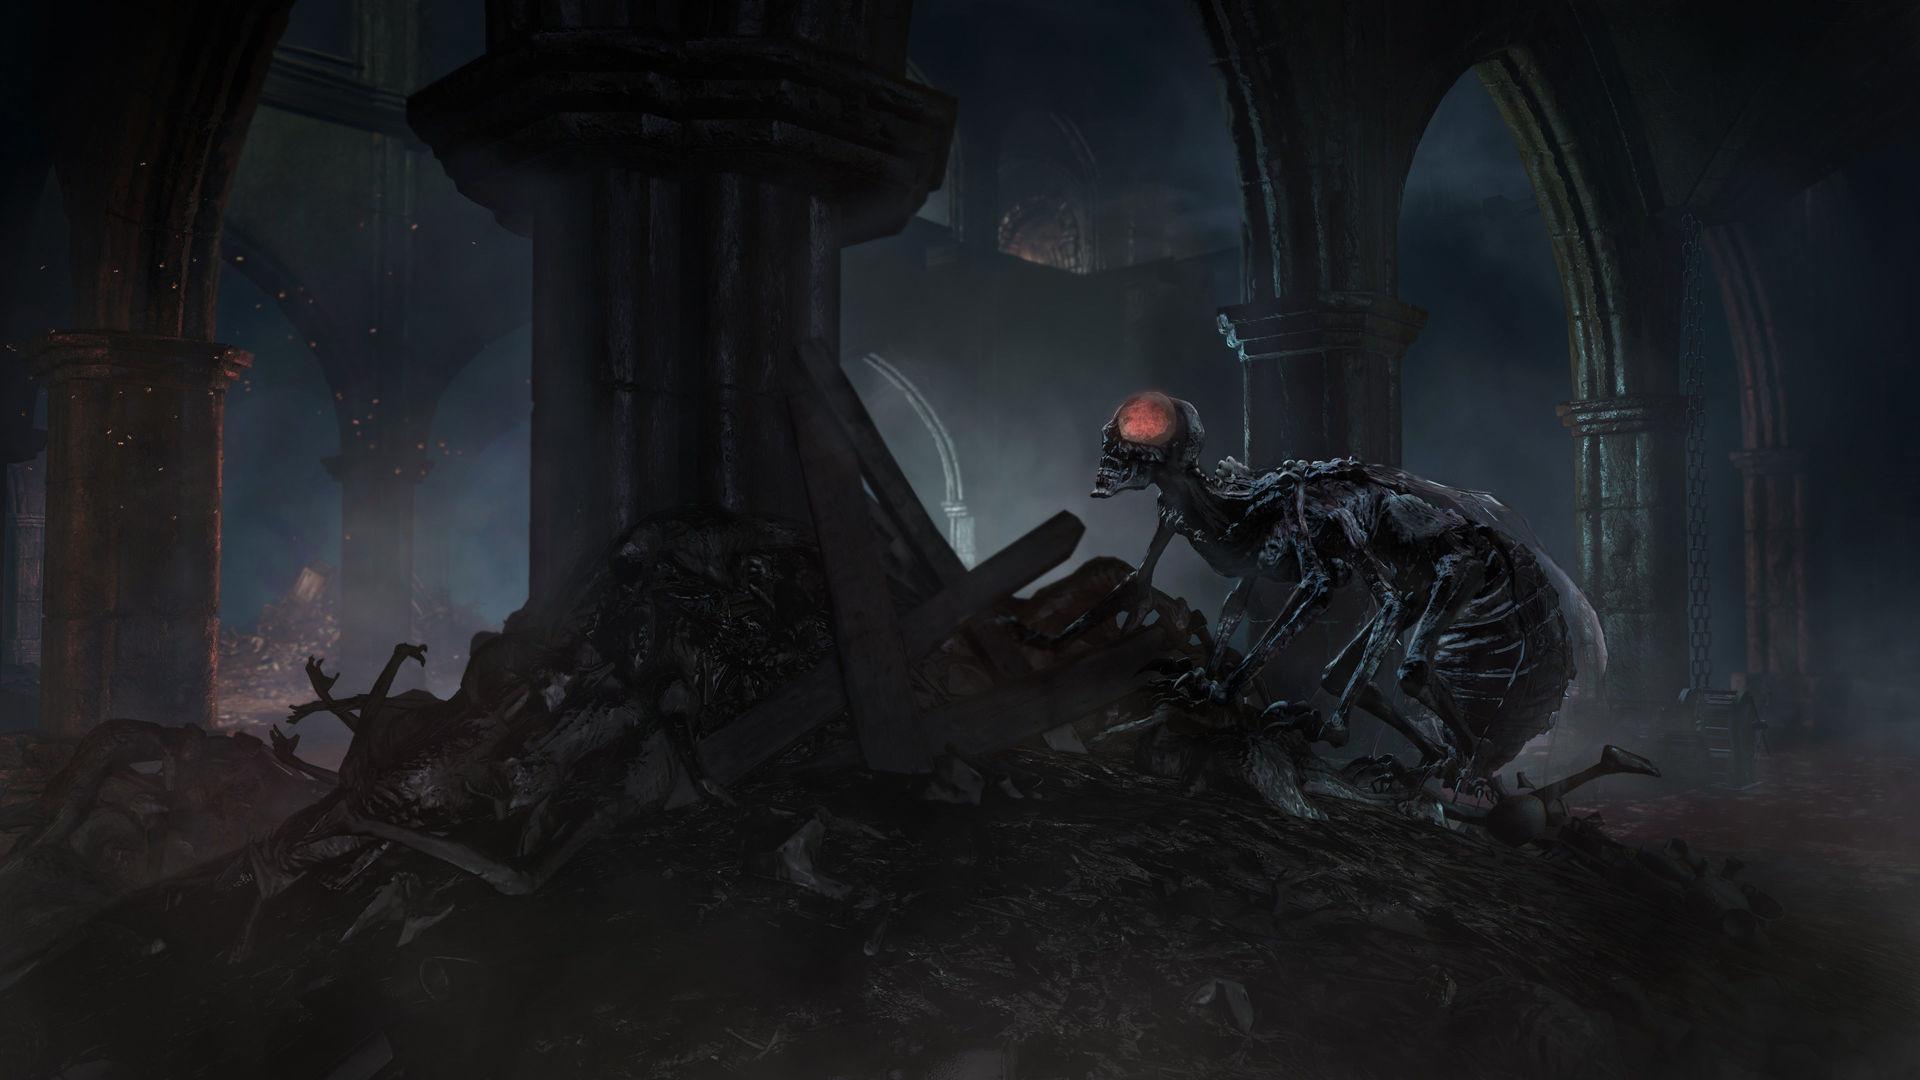 Wallpaper HD DARK SOULS III – DLC Ashes of Ariandel #DarkSouls3  #DarkSoulsIII #DarkSouls